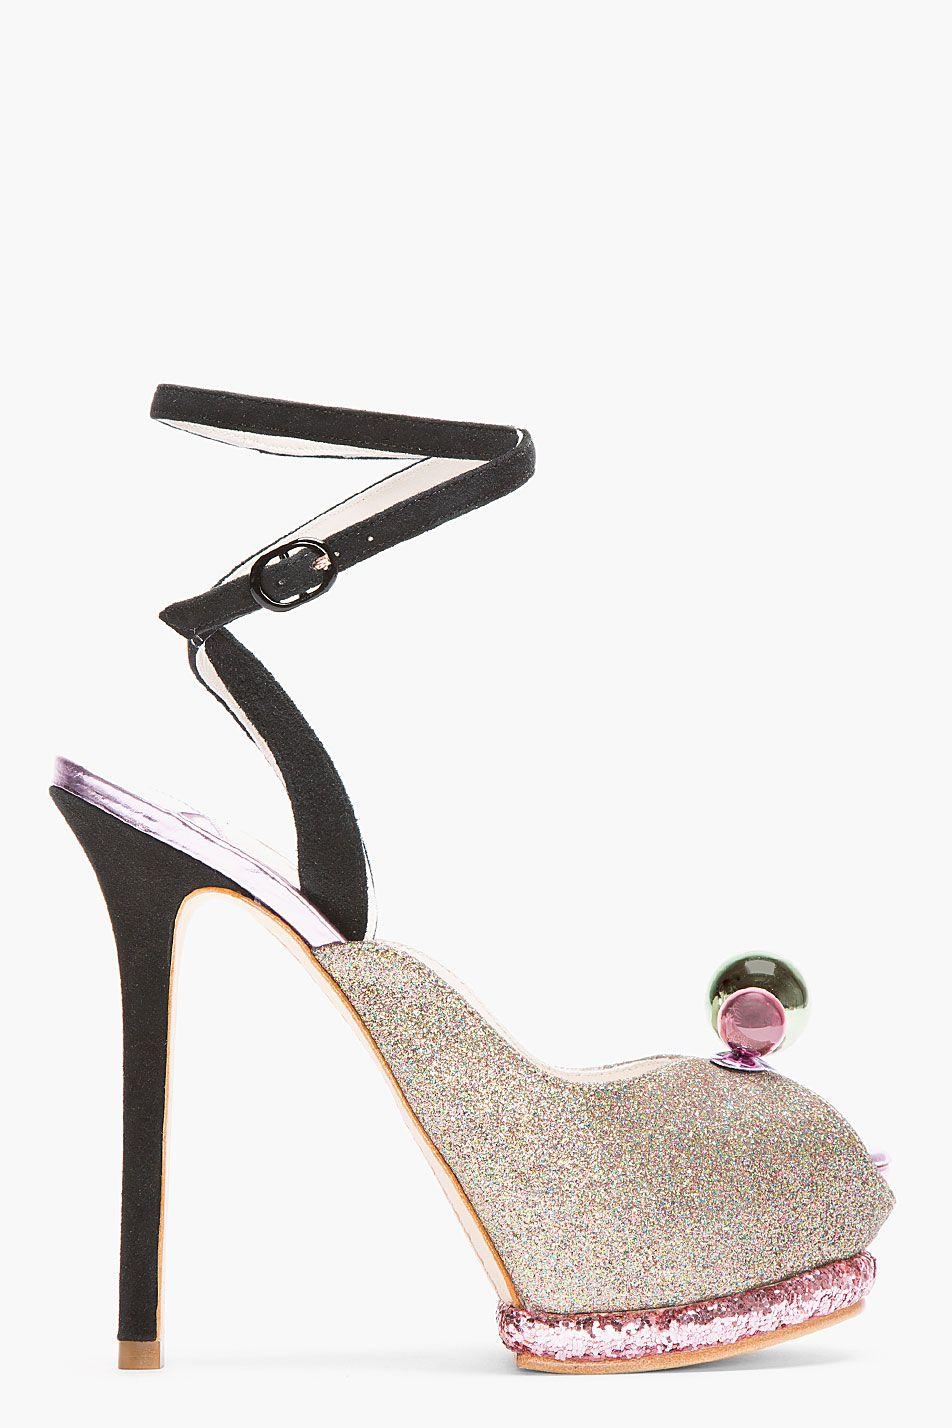 SOPHIA WEBSTER Mauve Glitter Bardot Ankle-Strap Heels · Zapatos BotinesZapatos  MujerTaconesSandaliasZapatillasLos ... 676152e2821